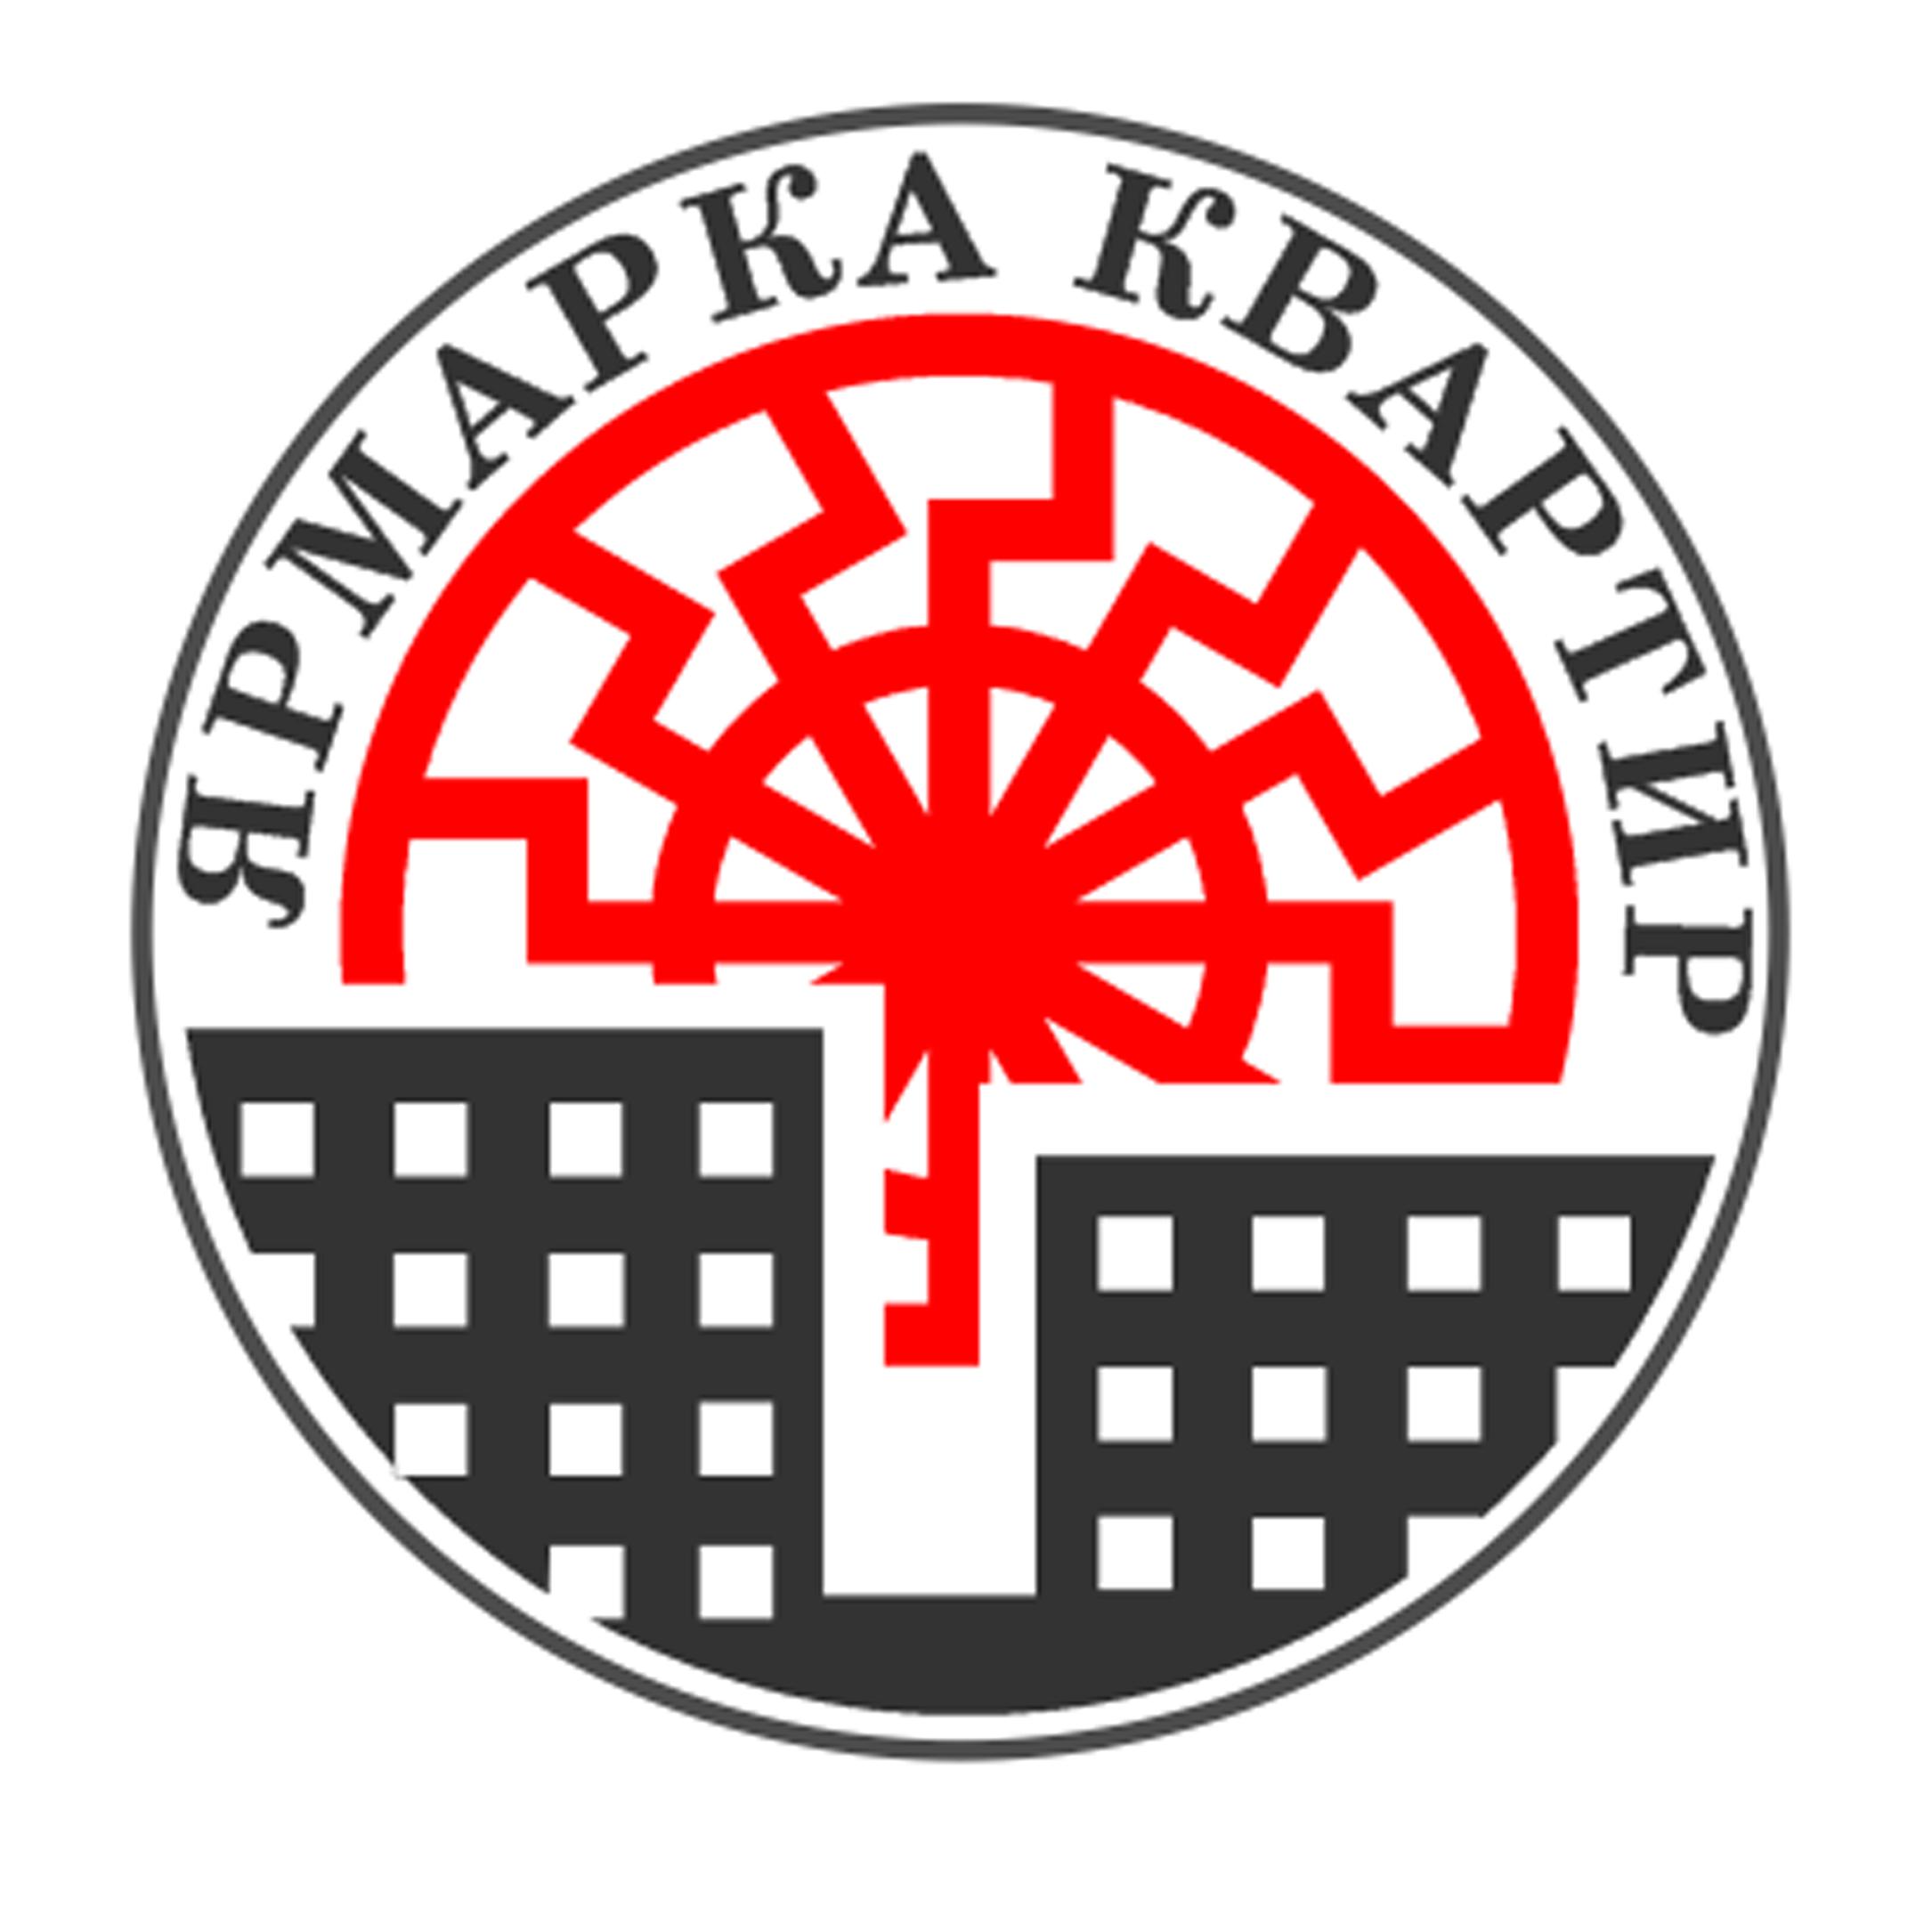 Создание логотипа, с вариантами для визитки и листовки фото f_89560048b0d94b87.png